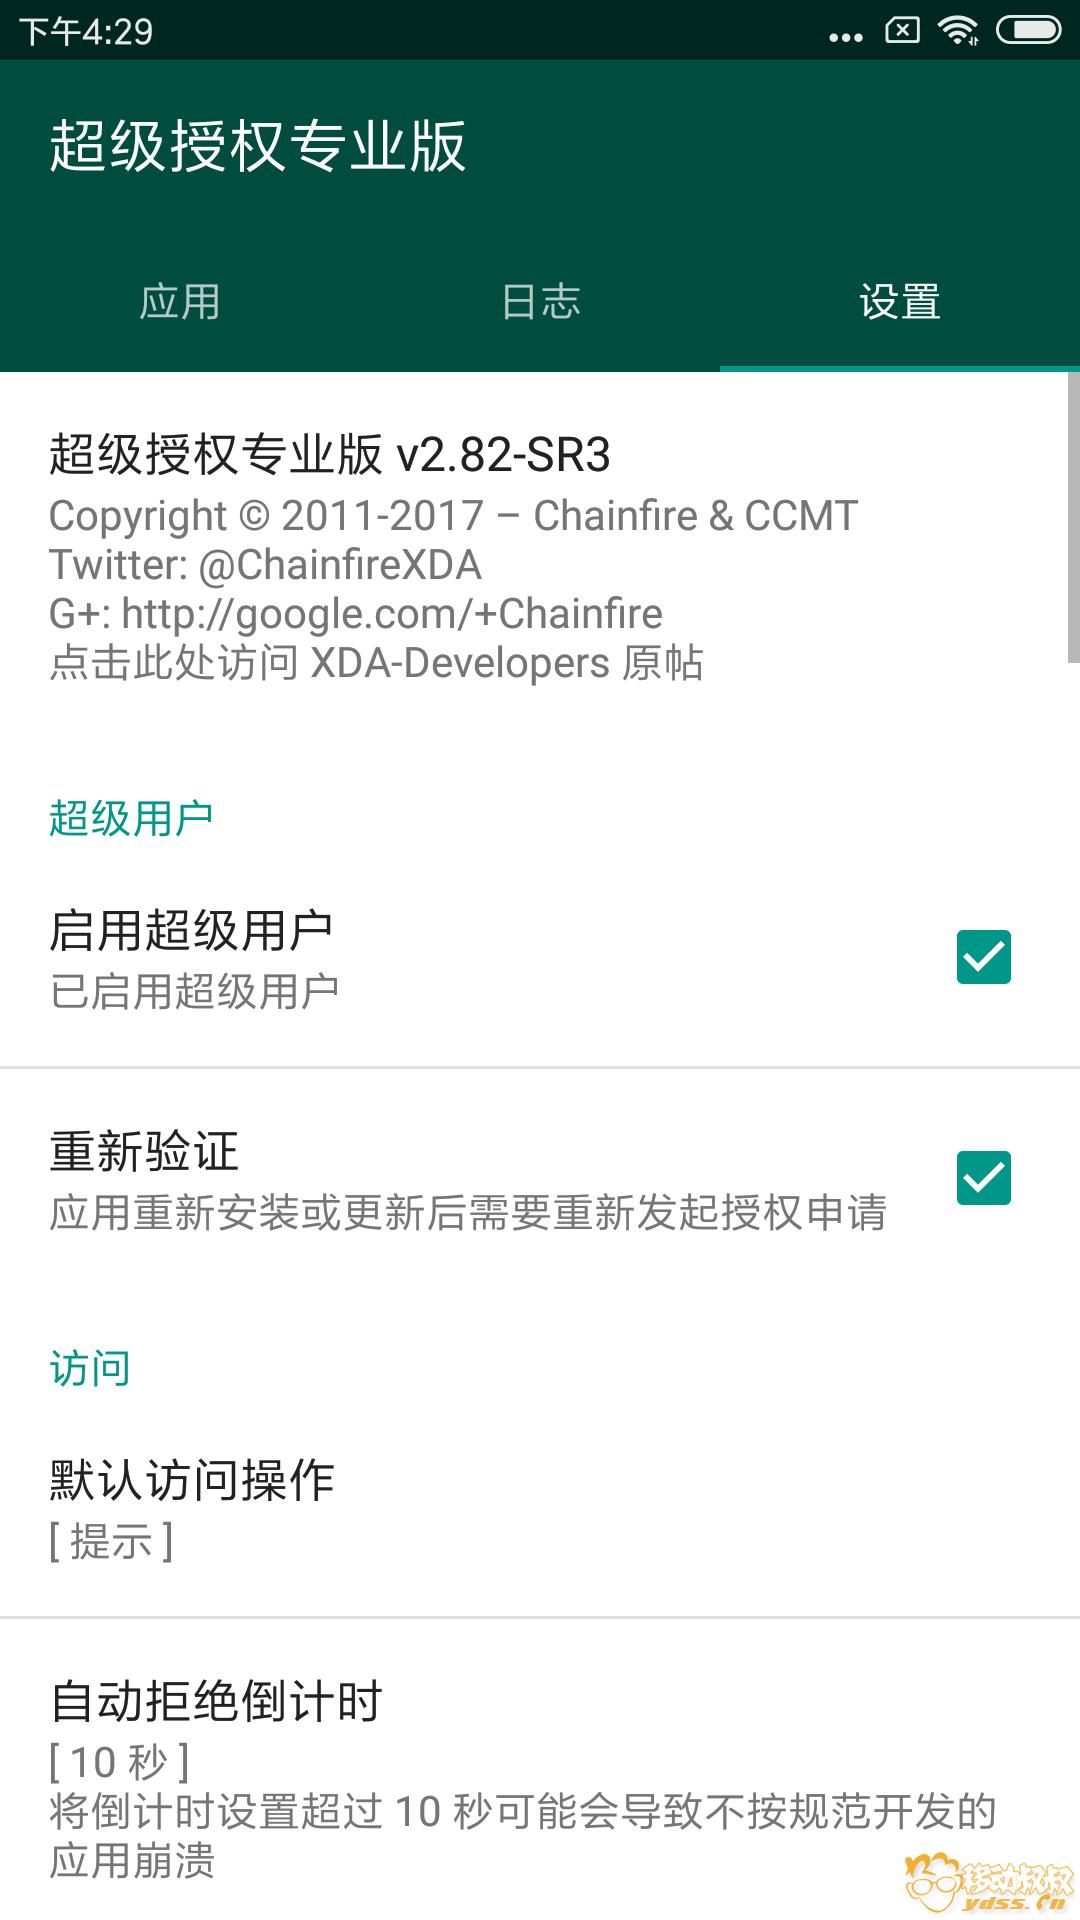 Screenshot_2018-07-07-16-29-48-283_eu.chainfire.supersu.png